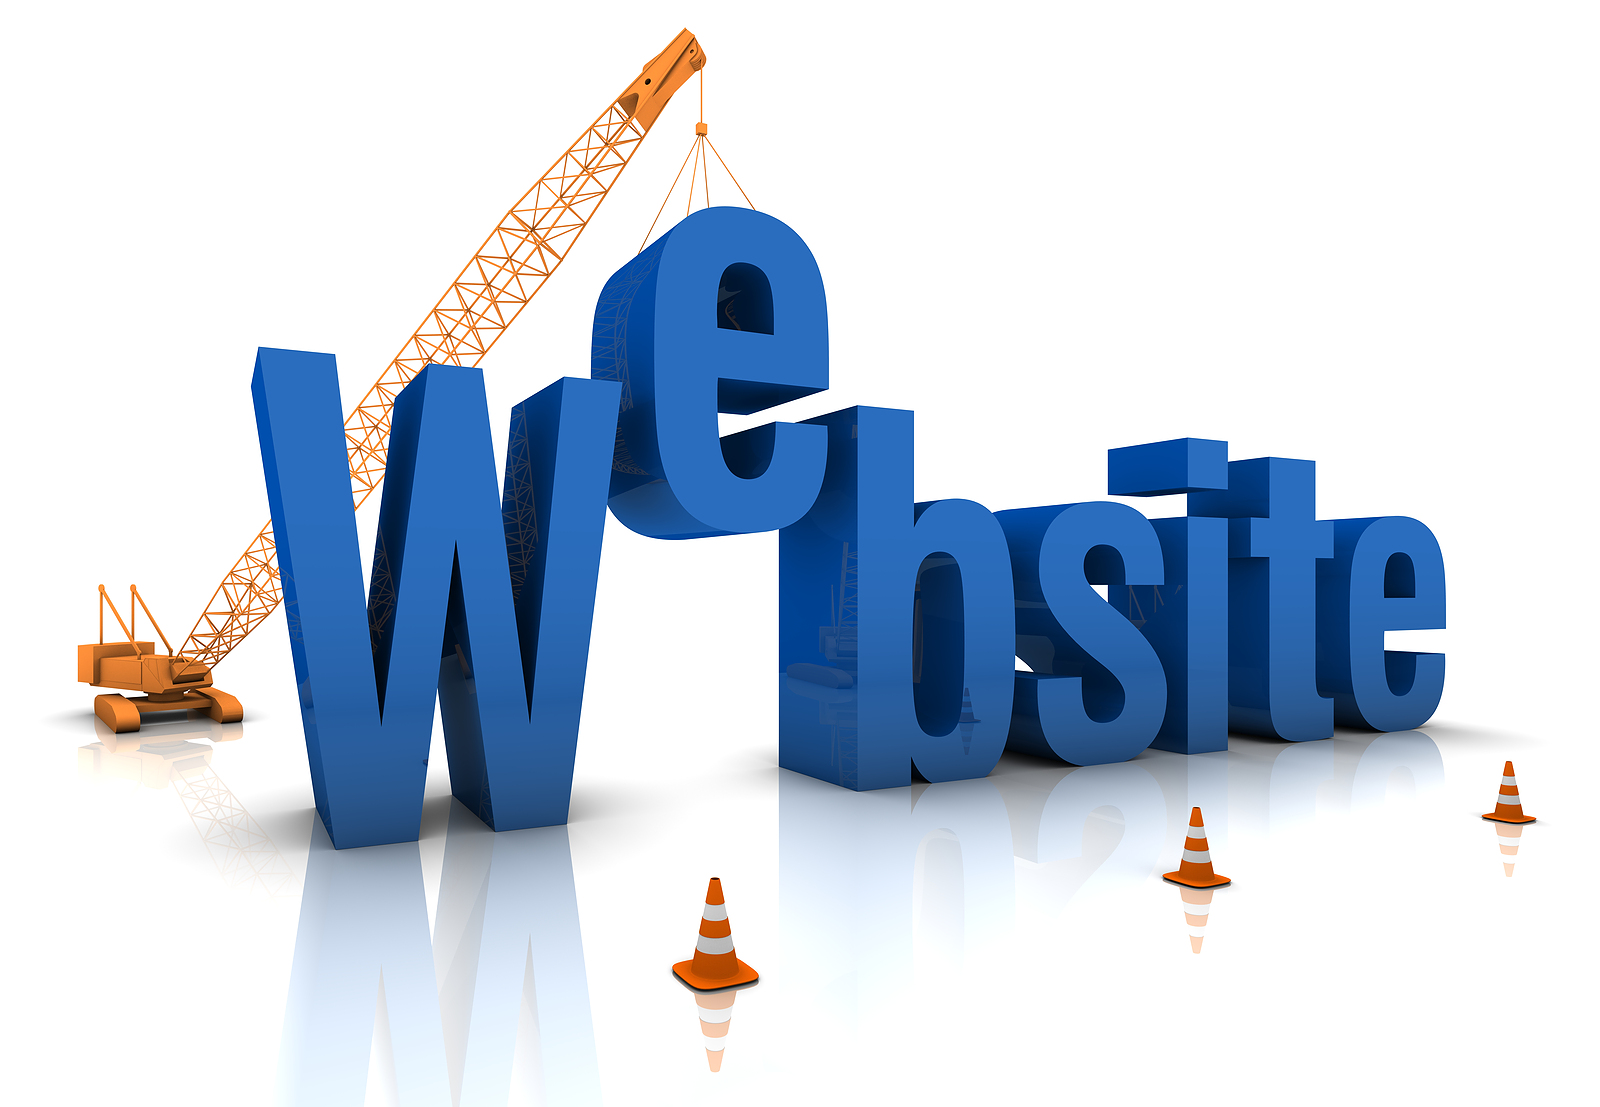 21 Website Unik yang Wajib Dikunjungi